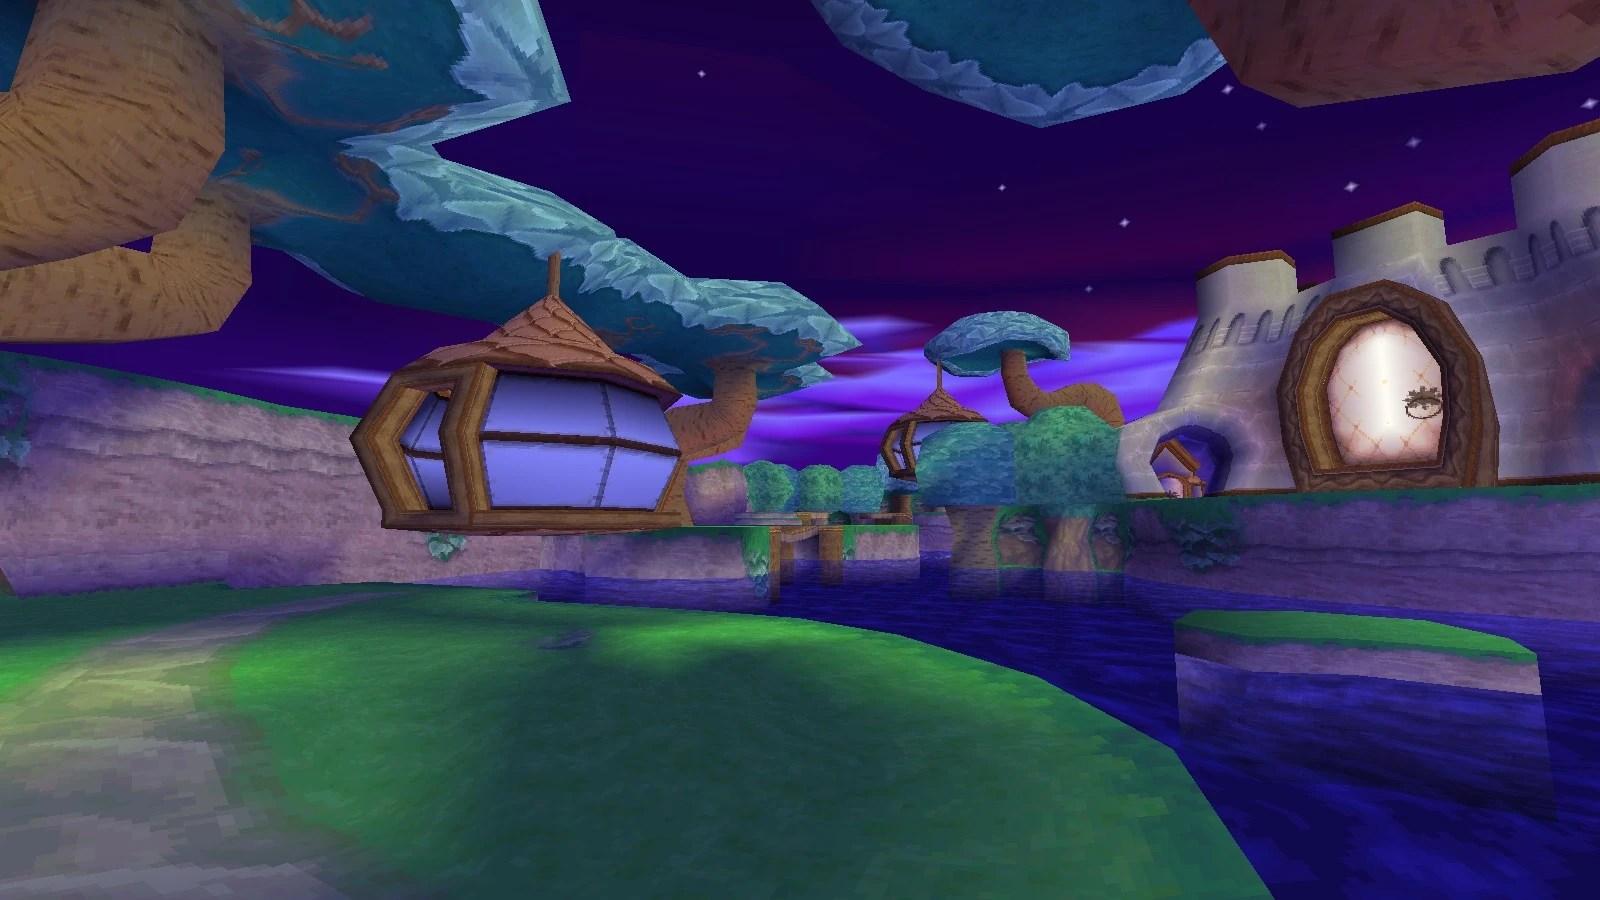 Fairy Tail 3d Wallpaper Spooky Swamp Spyro Wiki Fandom Powered By Wikia